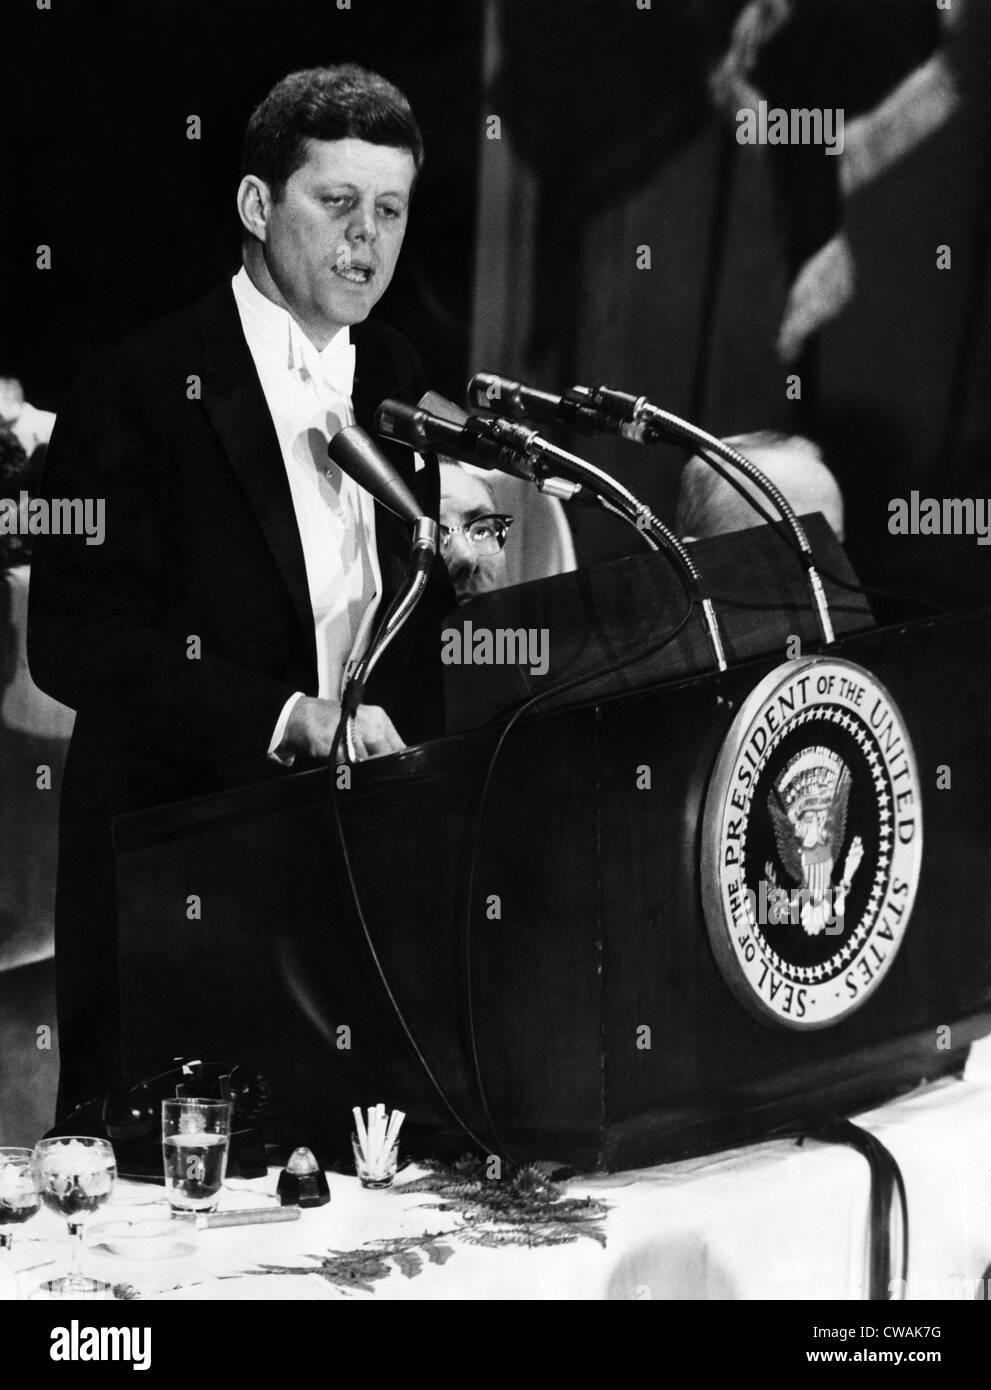 John F. Kennedy, aboga con el American Newspaper Publishers Association y a invocar a imponer la autocensura. Él Imagen De Stock